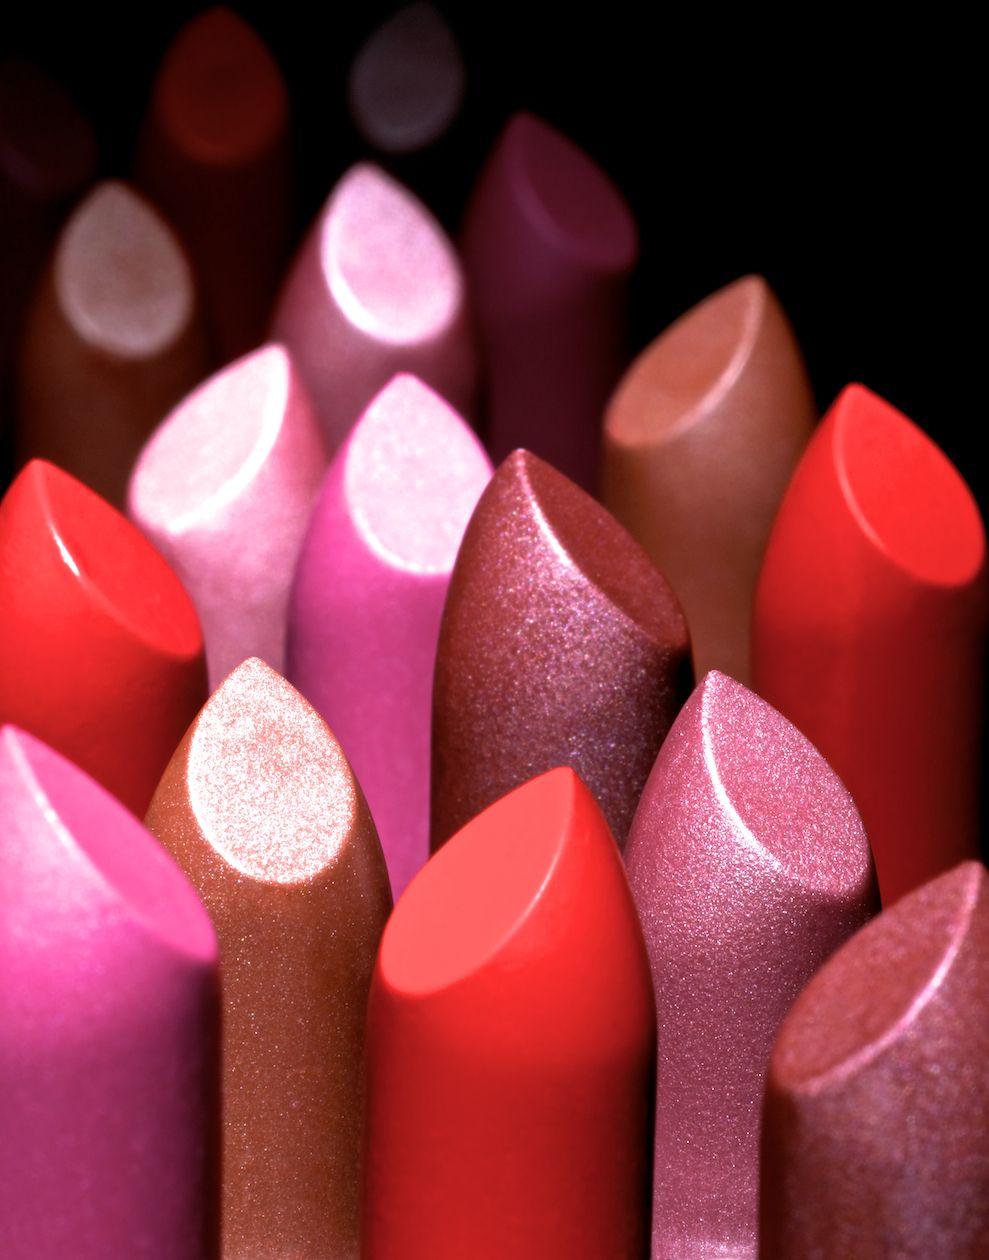 www.dennispedersen.com Product Photographer - Dennis Pedersen #Stilllife #Product #Photographer #Commercial #Advertising #Editorial #Creative #Beauty #Cosmetics #Makeup #Gloss  #Lipstick #red #pink #nude #Lips